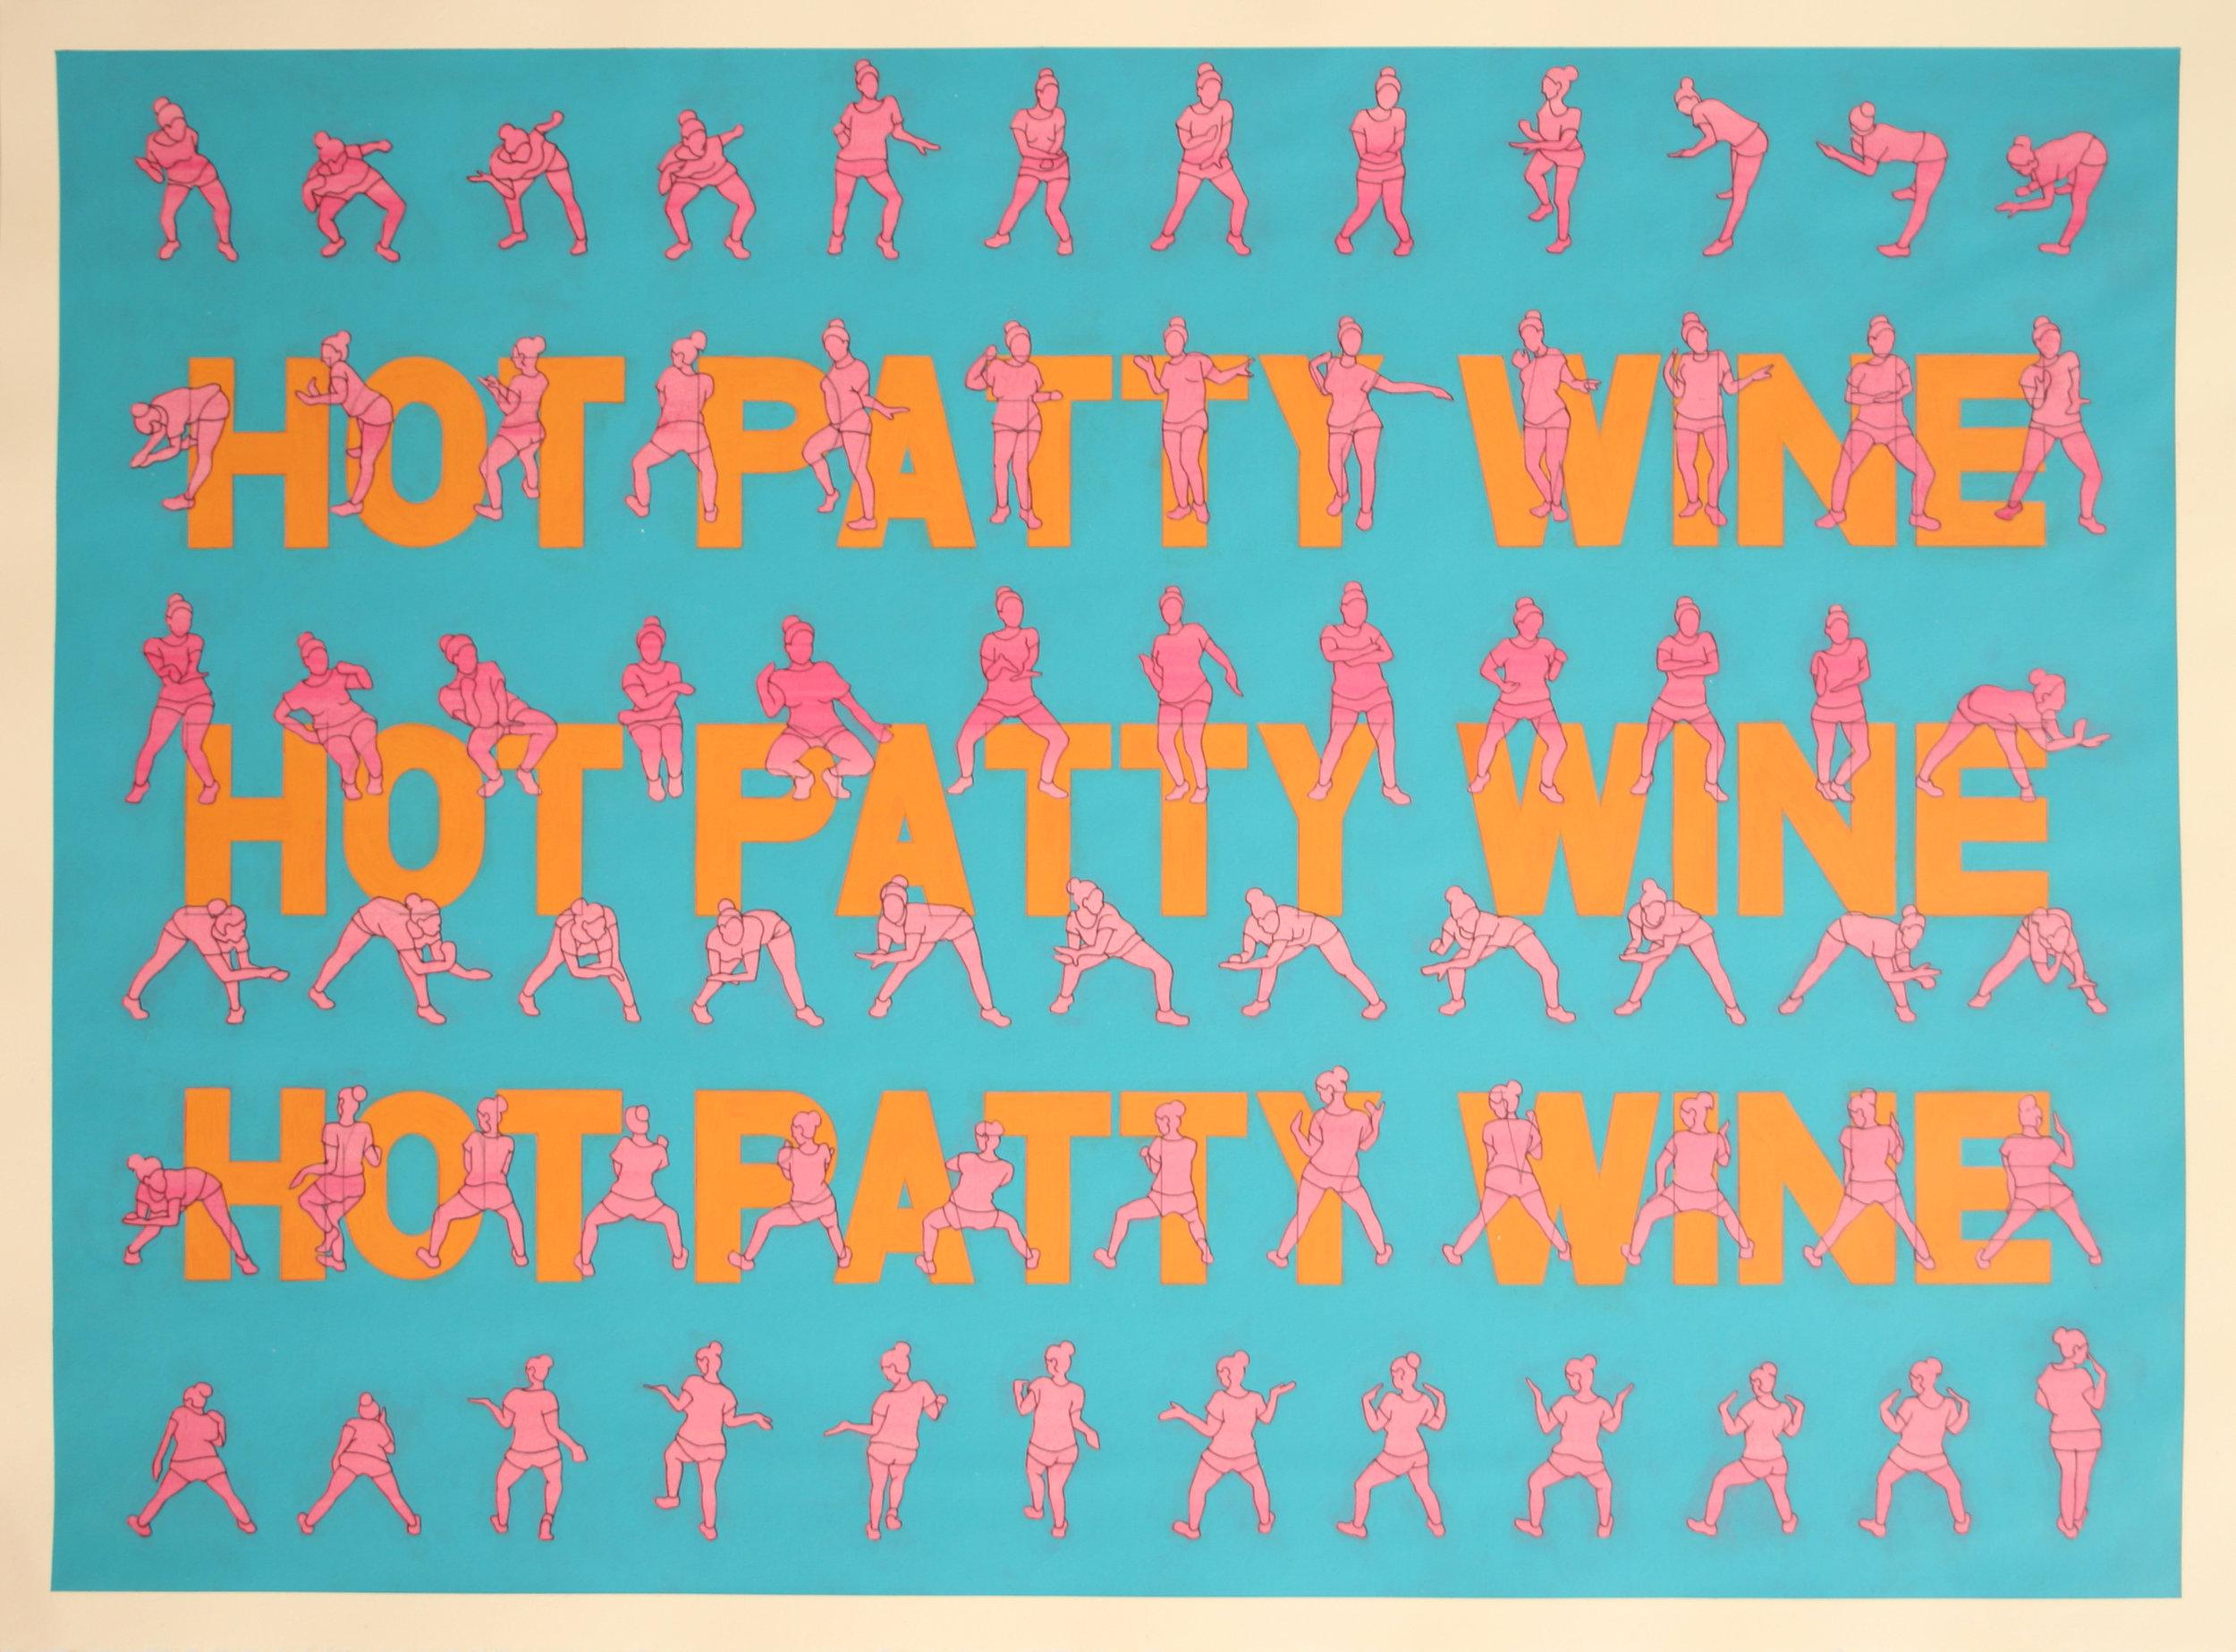 Hot Patty Wine